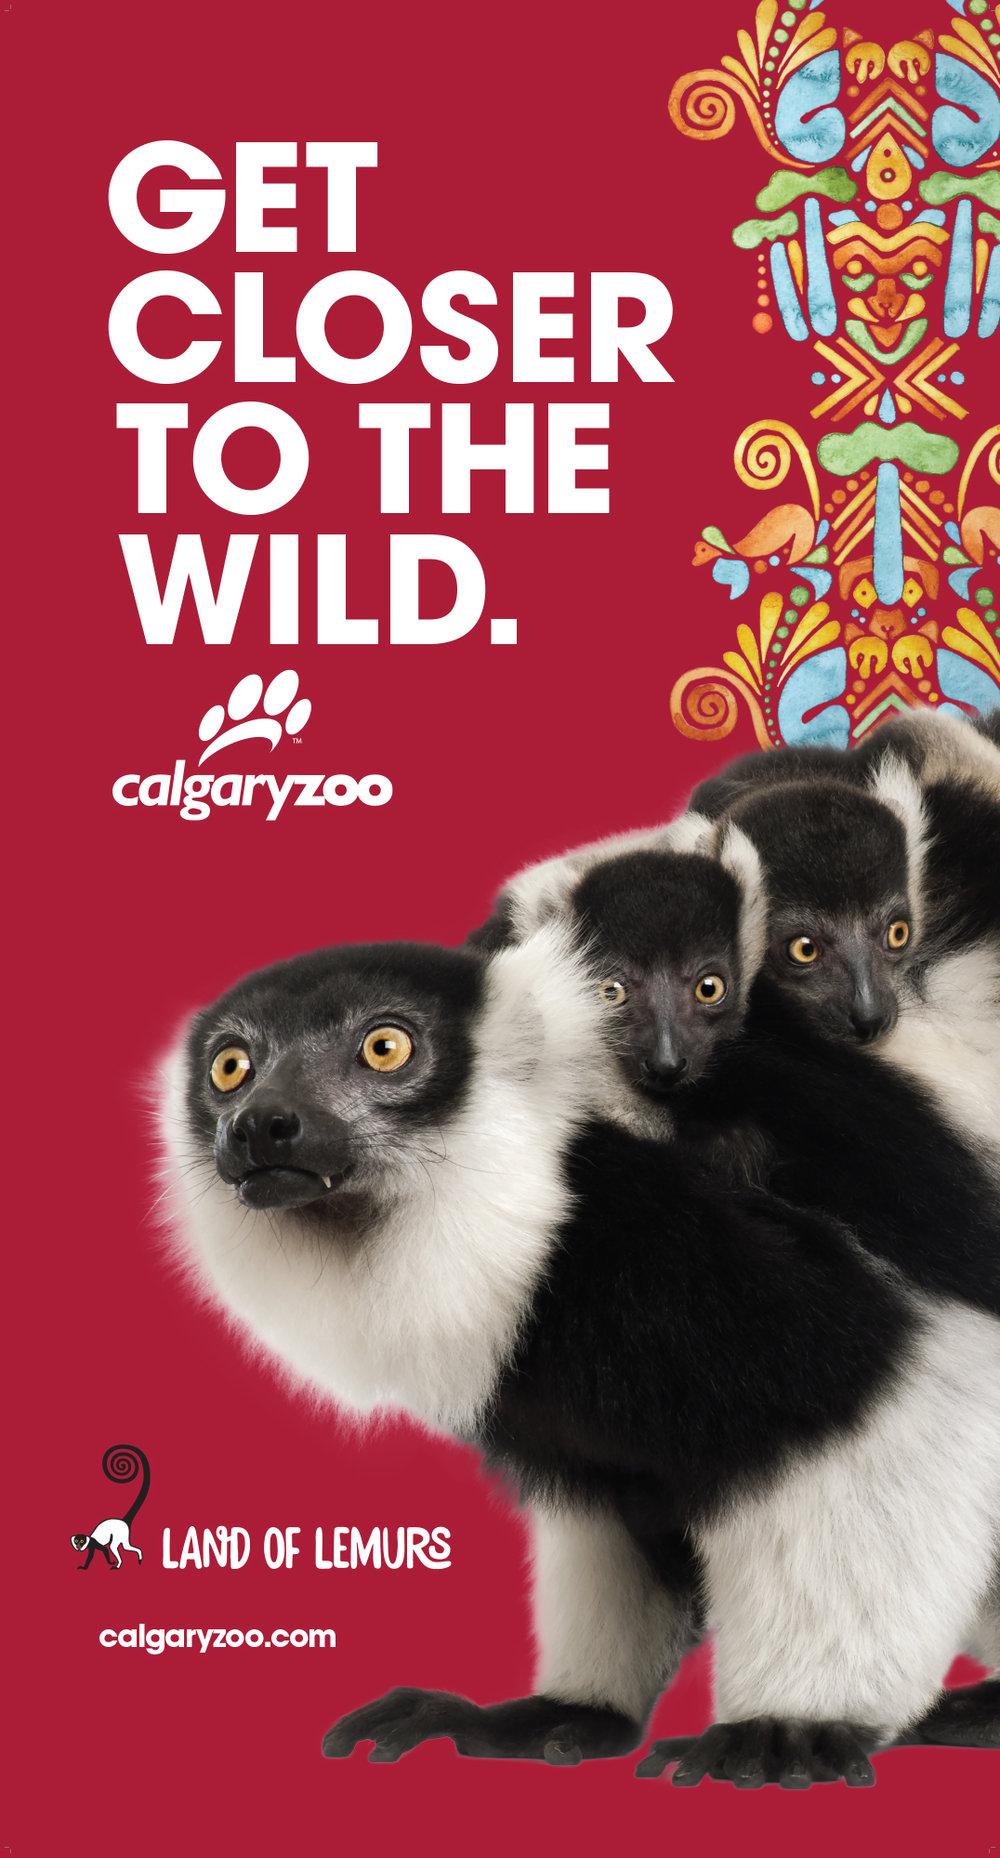 JTAD_Zoo_LemurBanner.jpg